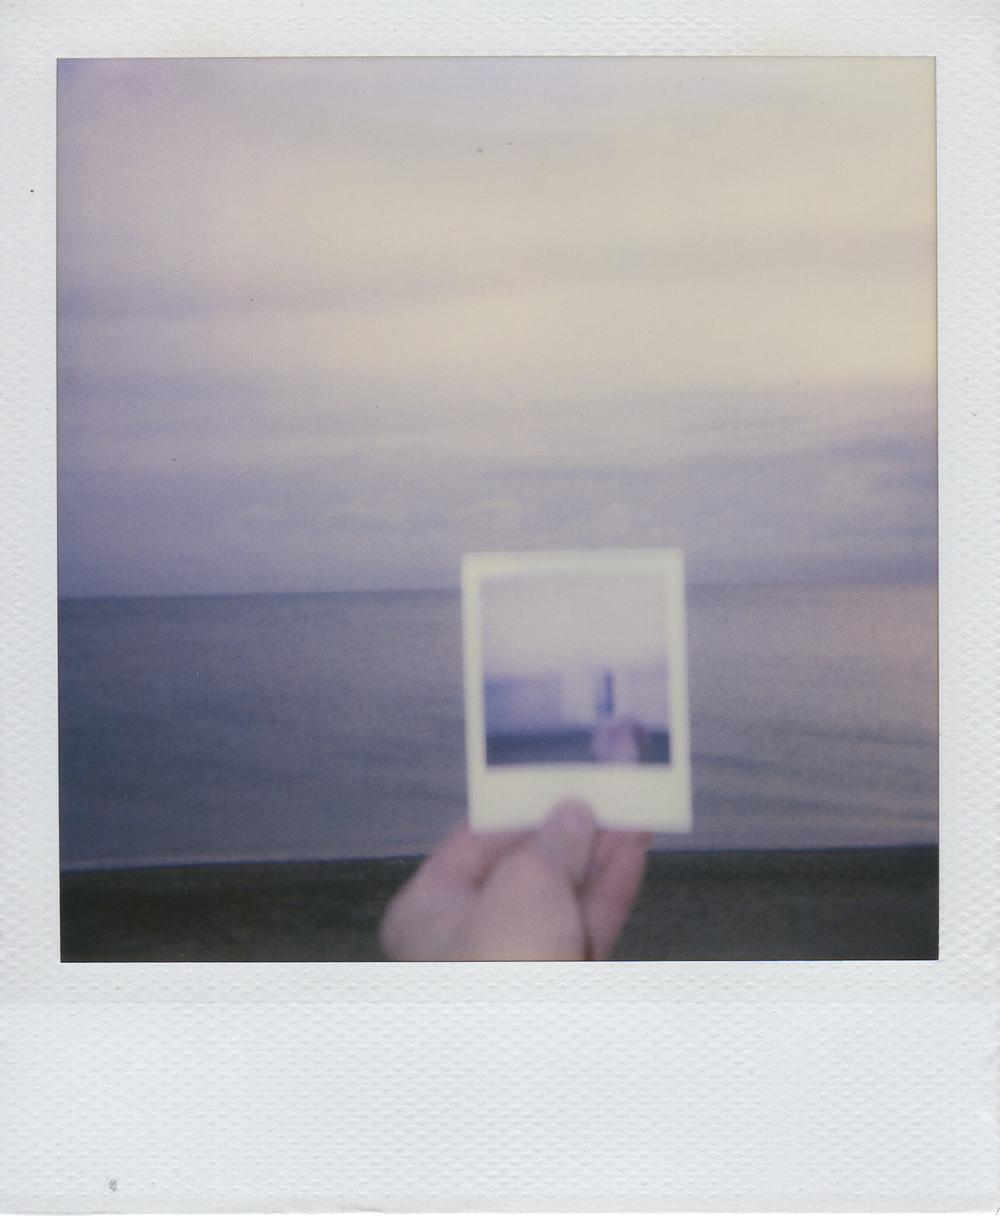 jlaurence-polaroid-099.jpg